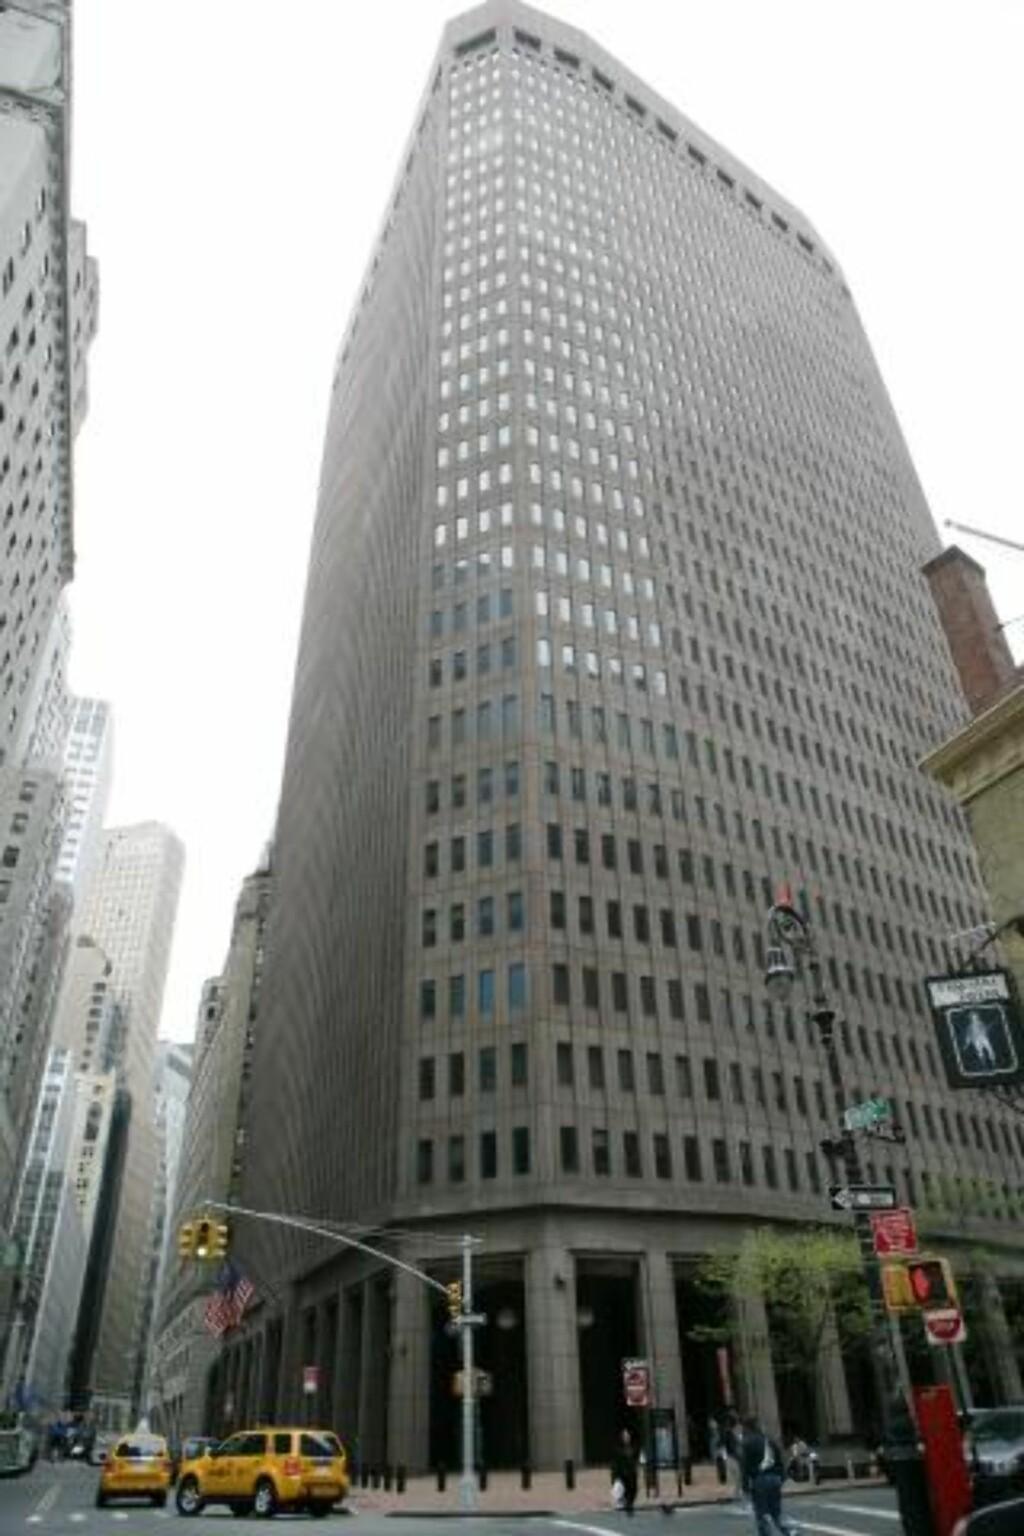 NEW YORK: Goldman Sachs-bygningen i New York. FOTO: GINO DOMENICO/EPA